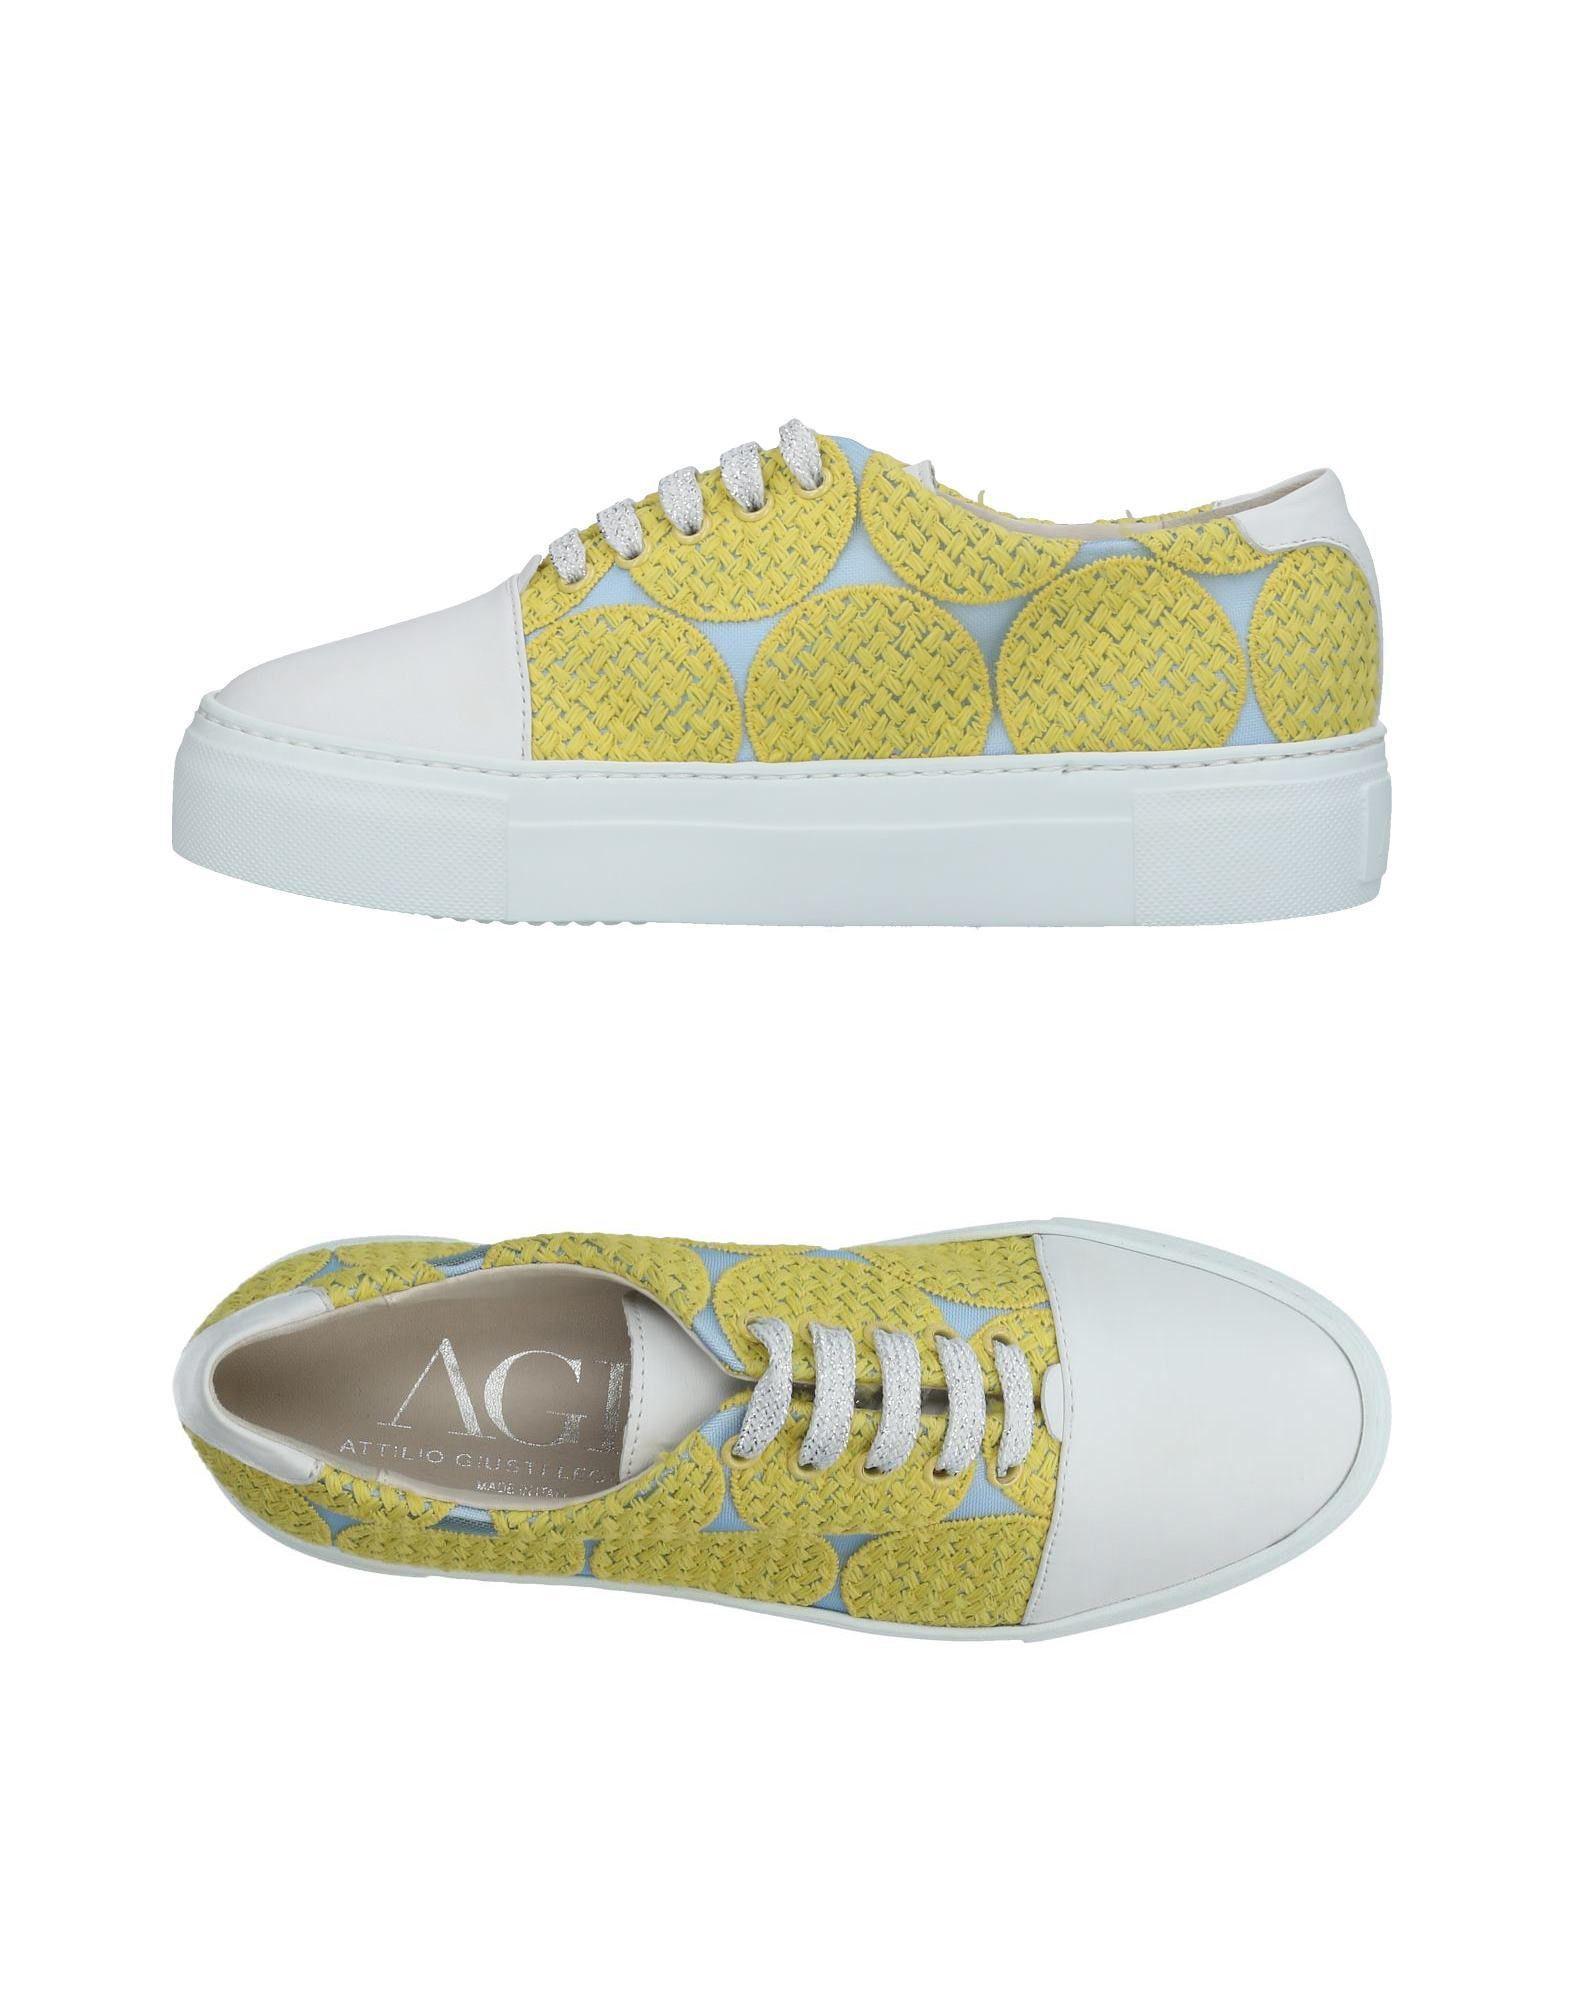 FOOTWEAR - Low-tops & sneakers Attilio Giusti Leombruni lvo1fF